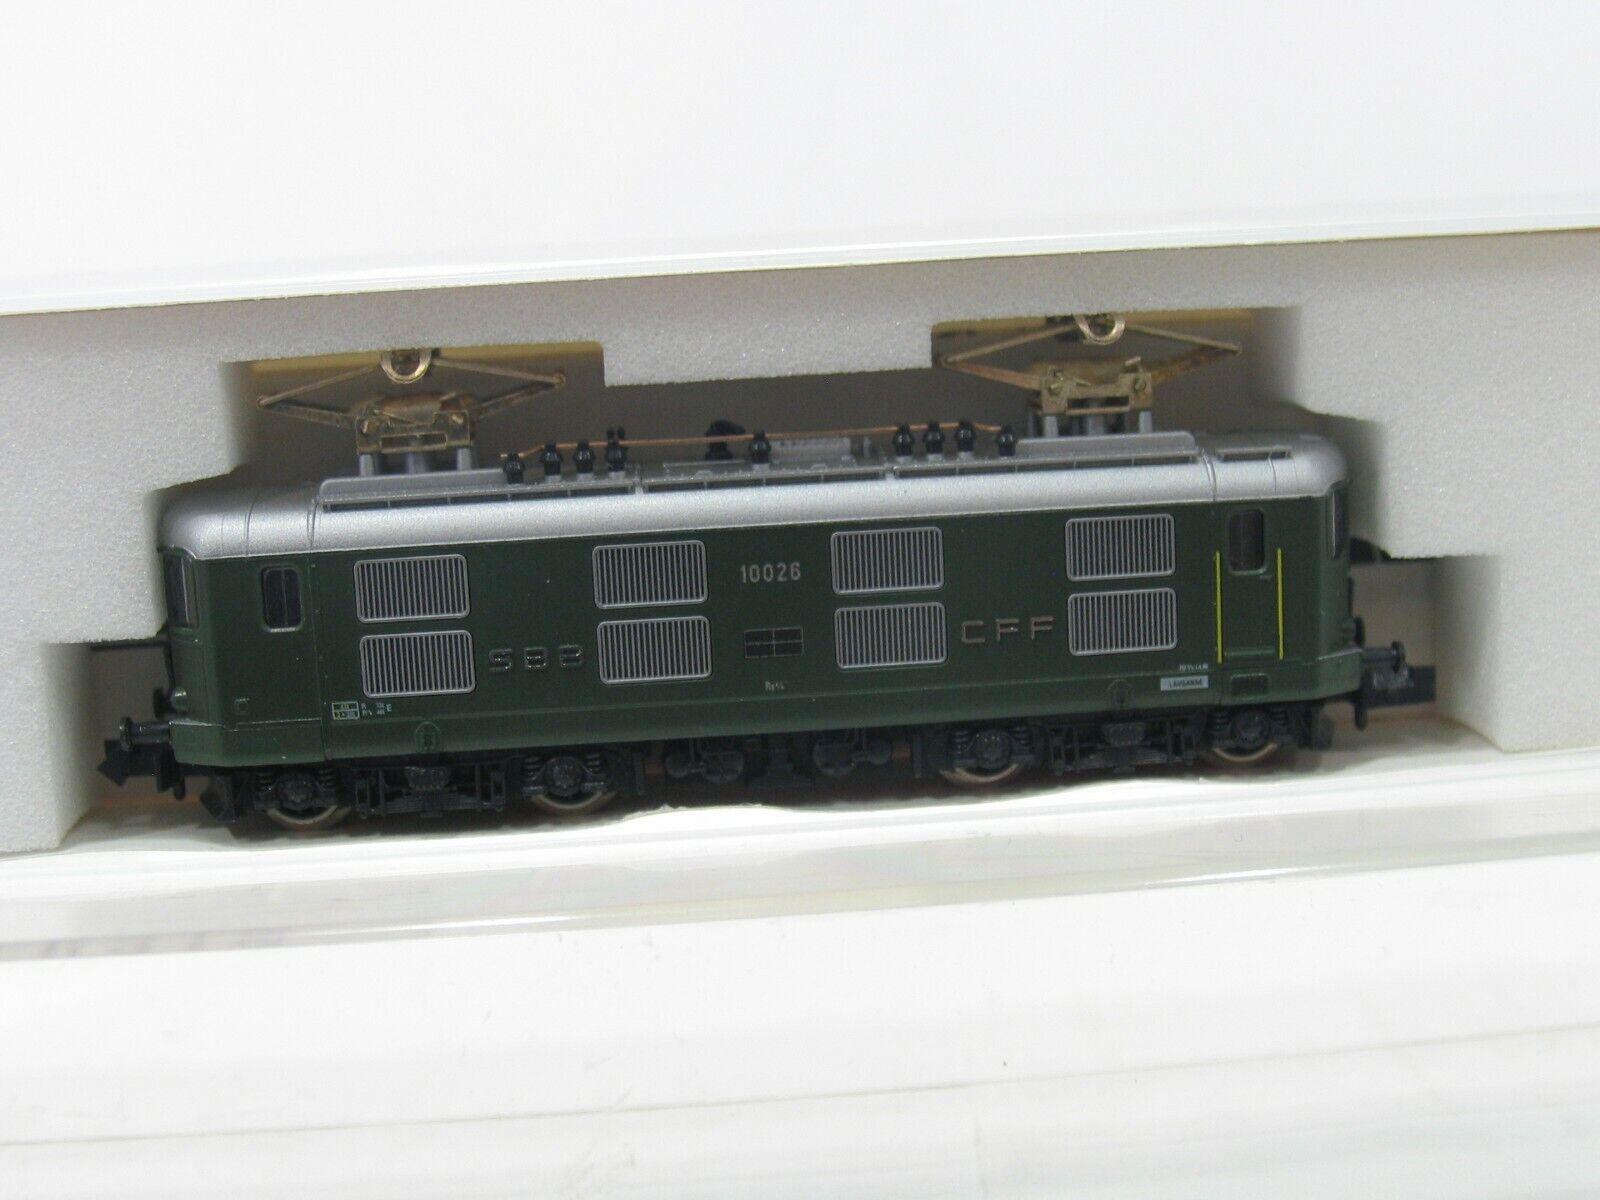 Hobbytrain 11011 e-Lok re 4 4  10026  de verde SBB nh227